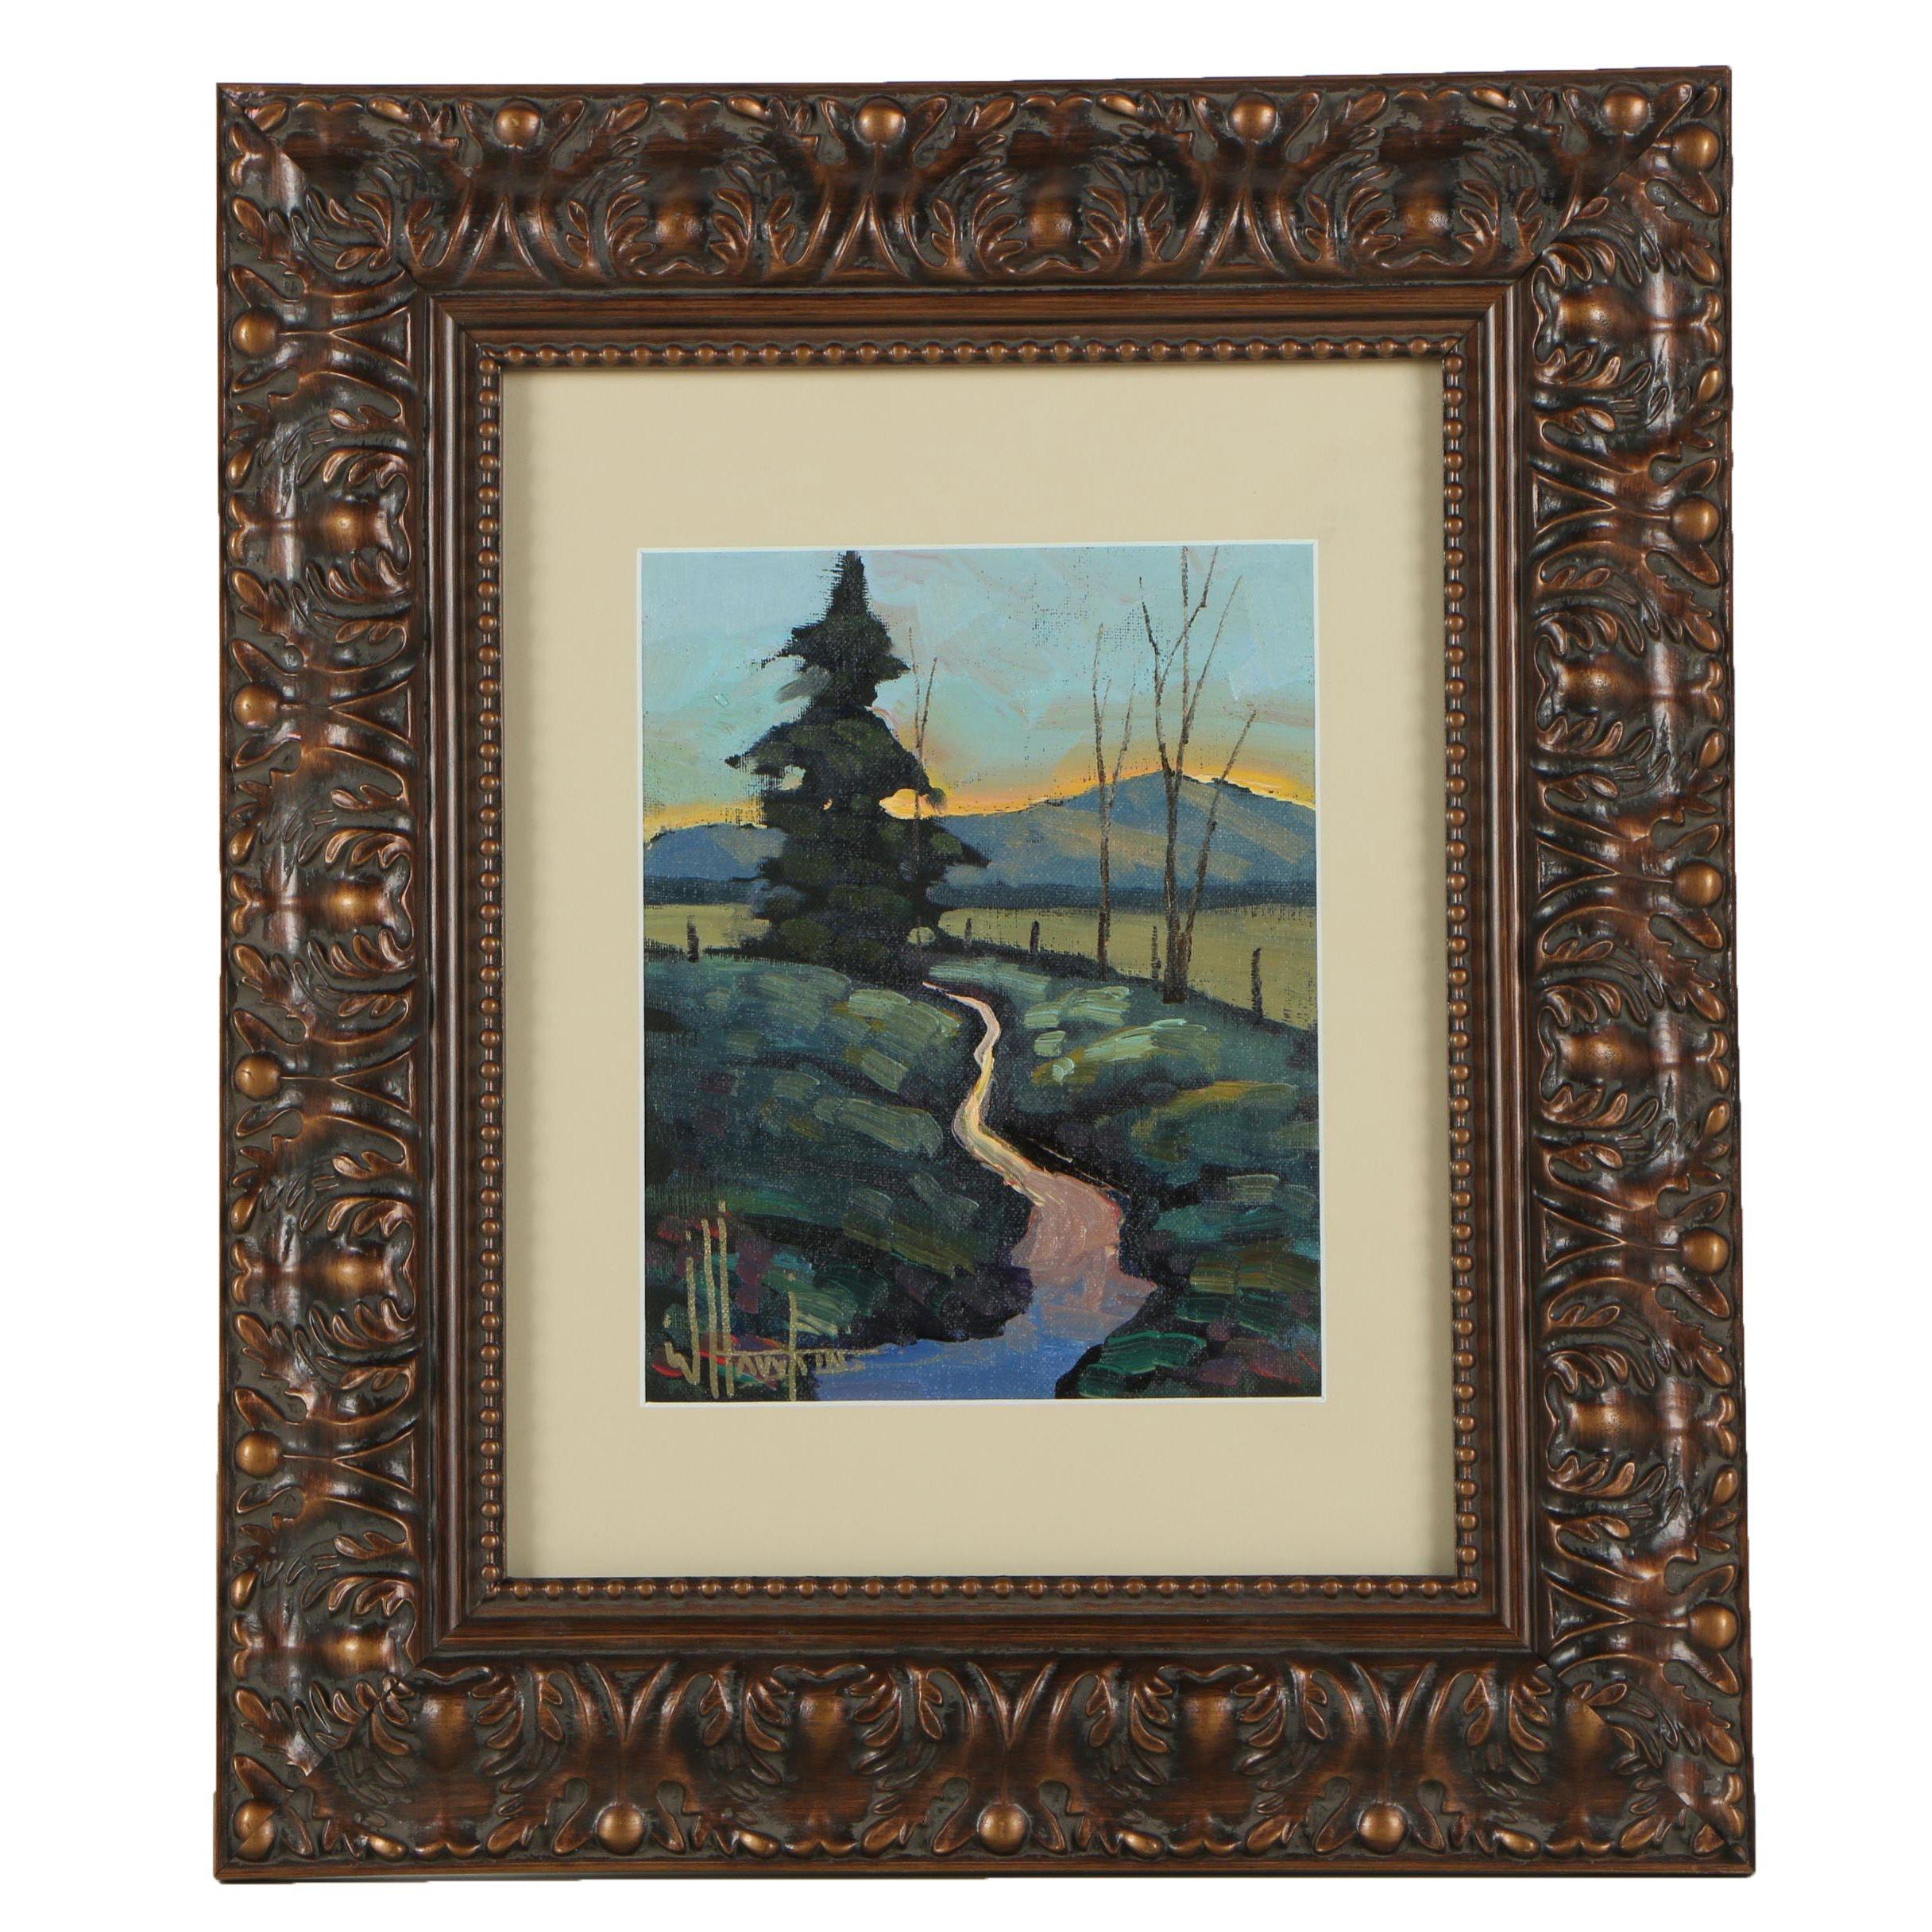 W. Hawkins Oil Painting